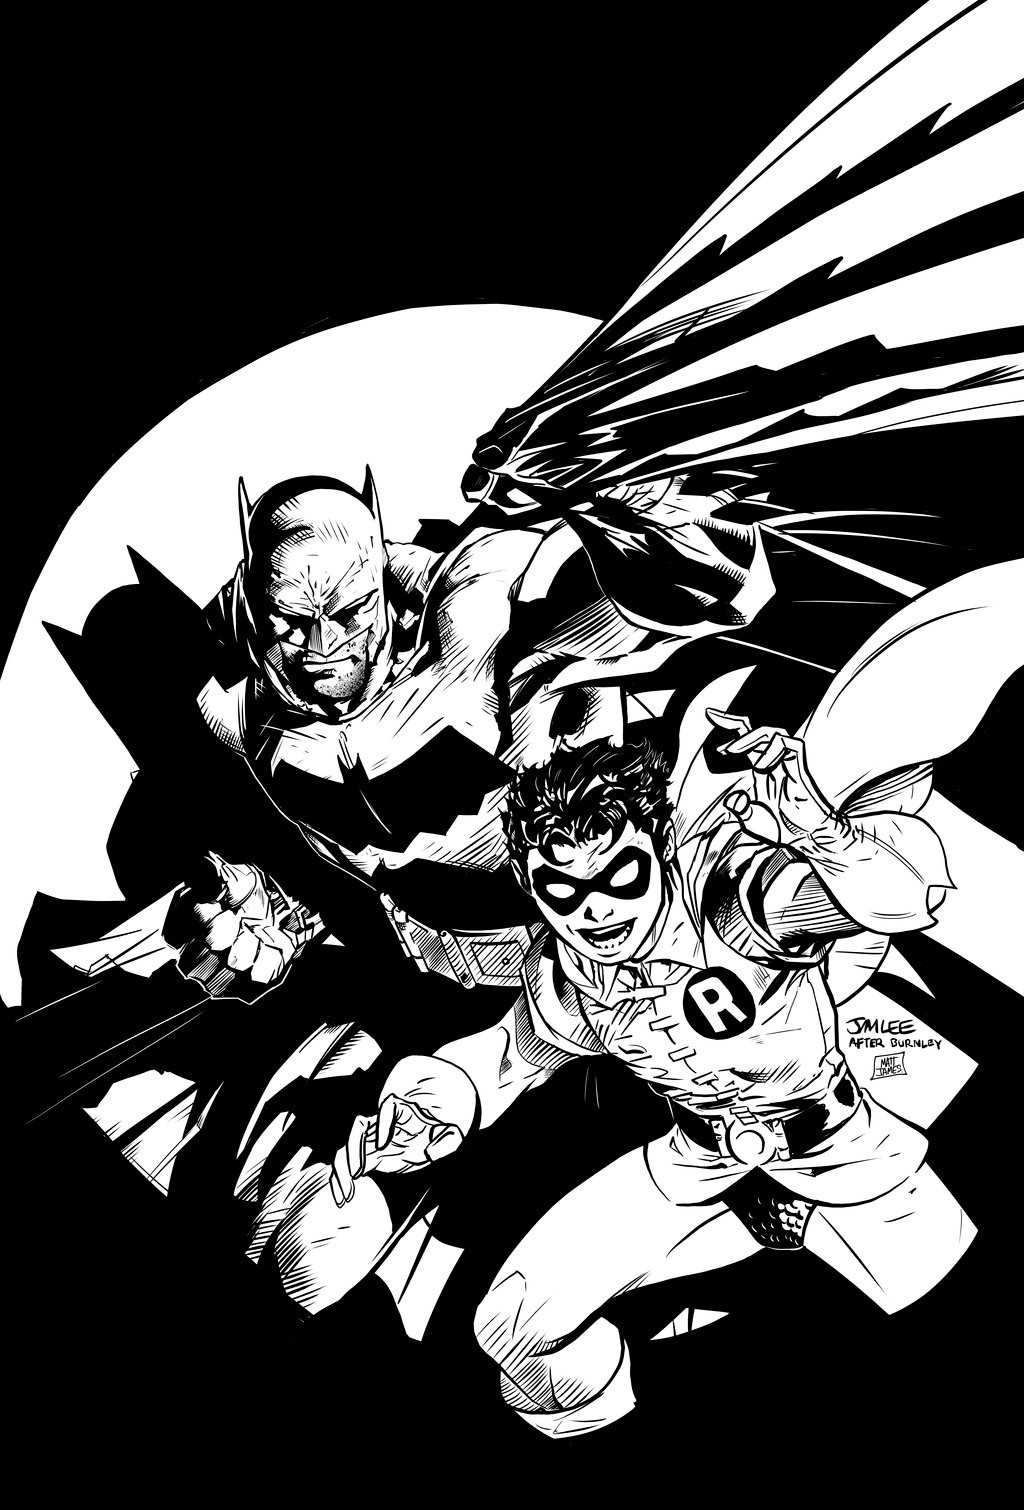 Matt james batman and robin jim lee by snakebitartstudio dbqrhb8